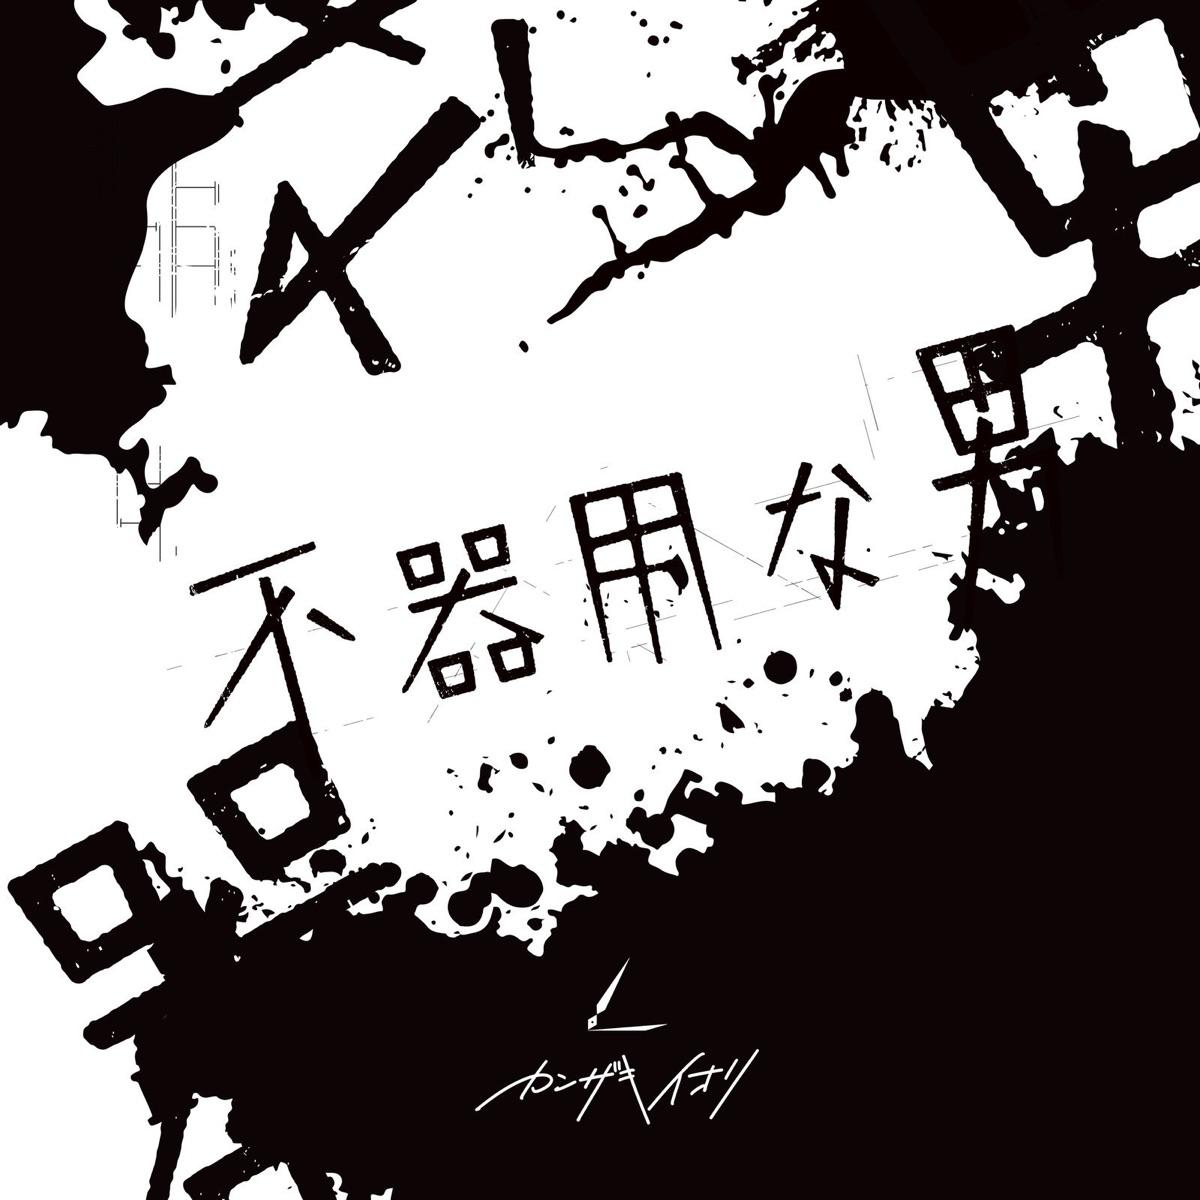 Cover image of『Kanzaki IoriInochi ni Kiwarete iru.』from the Album『Clumsy Man』